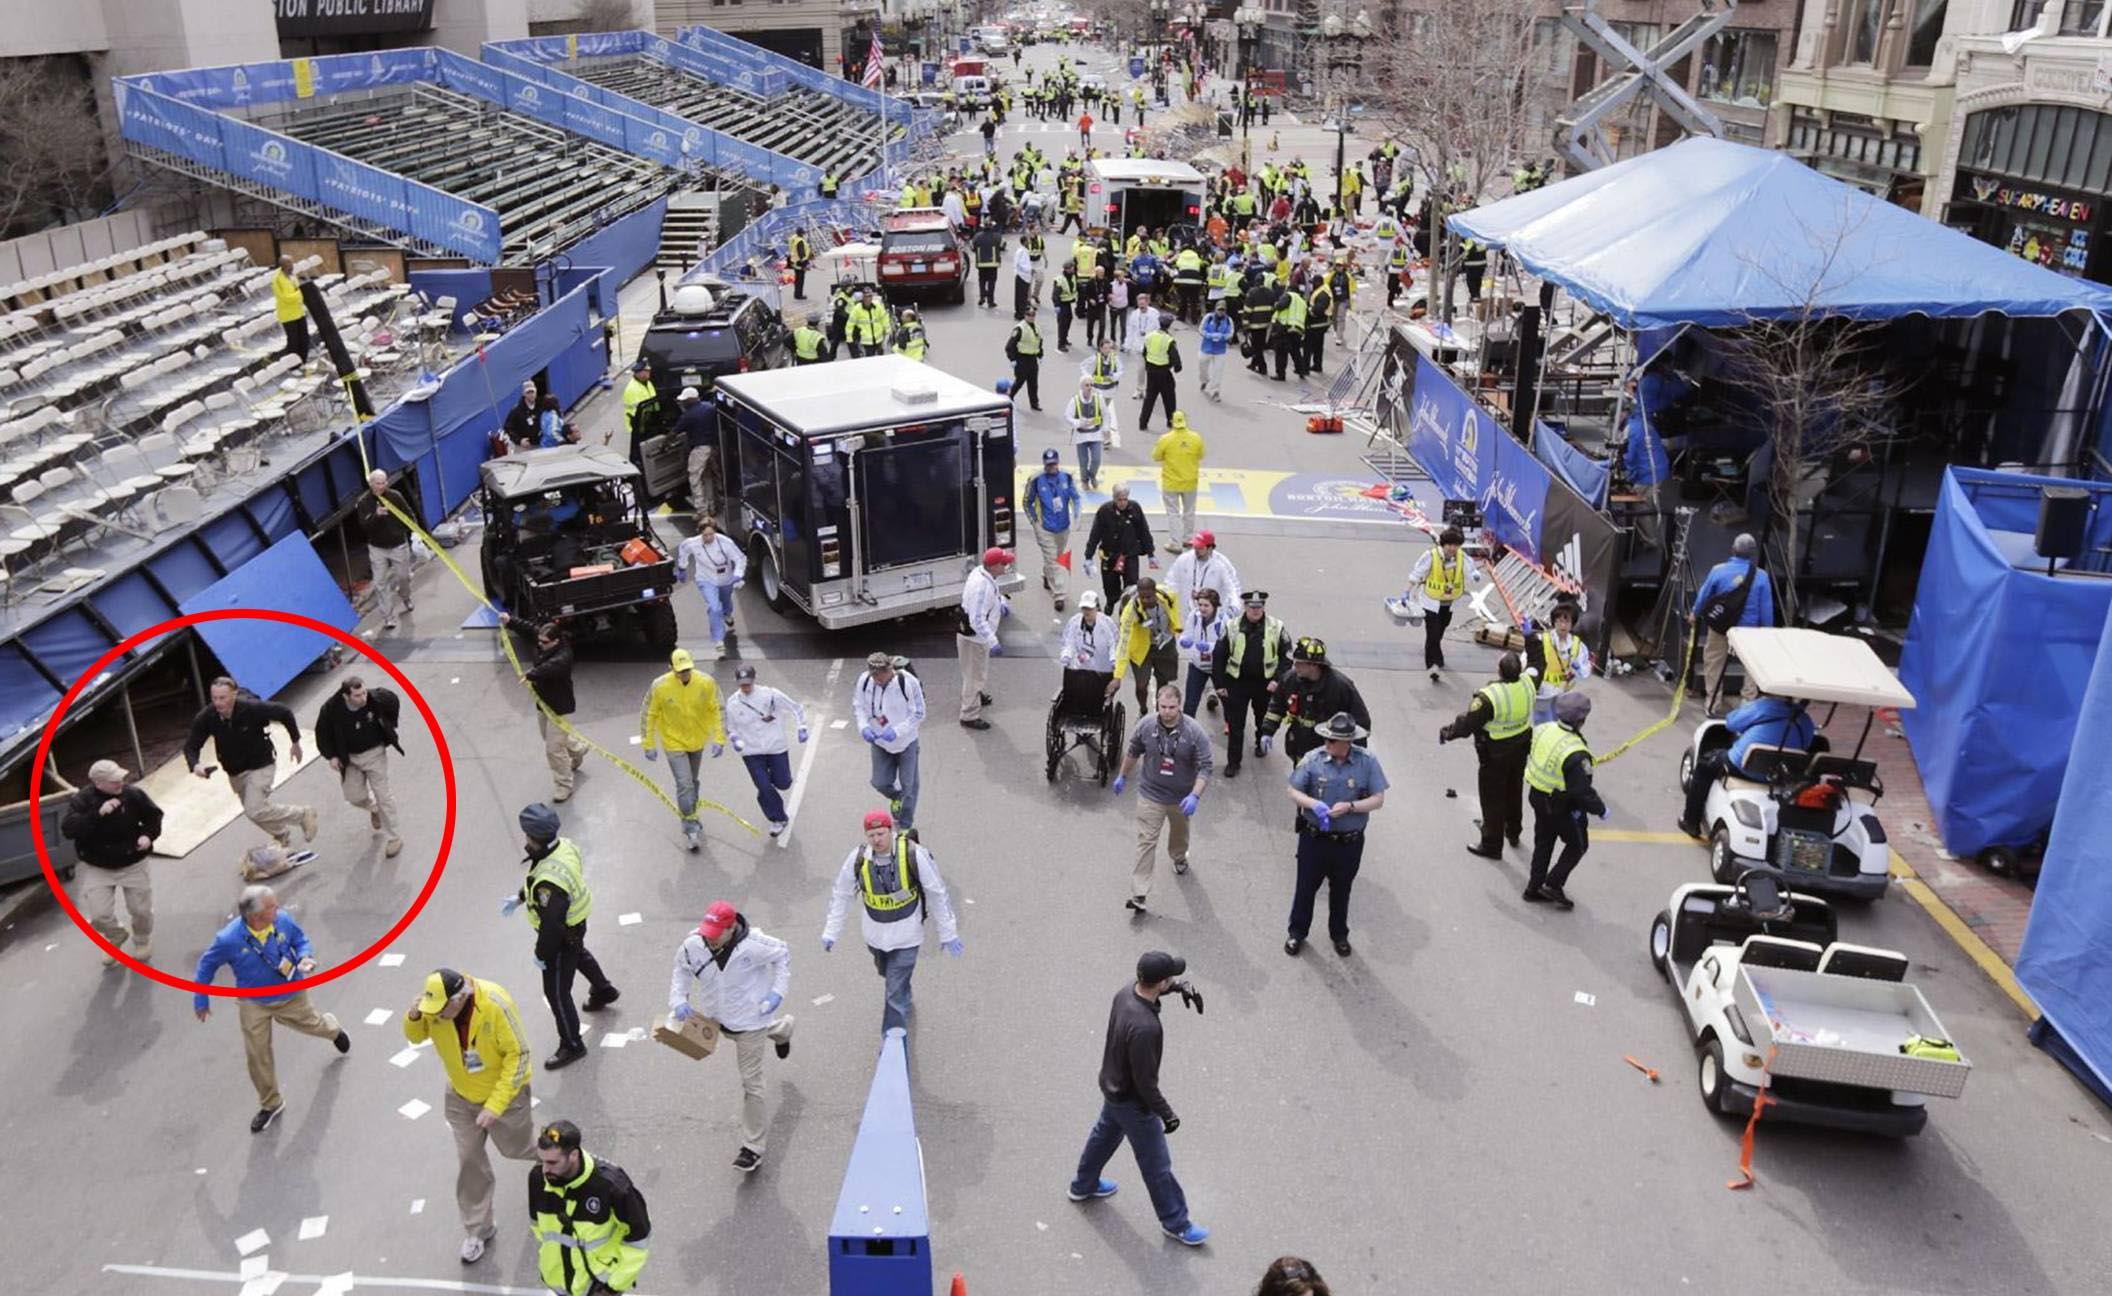 https://i1.wp.com/whatreallyhappened.com/IMAGES/BostonBomb/blackandtan.jpg